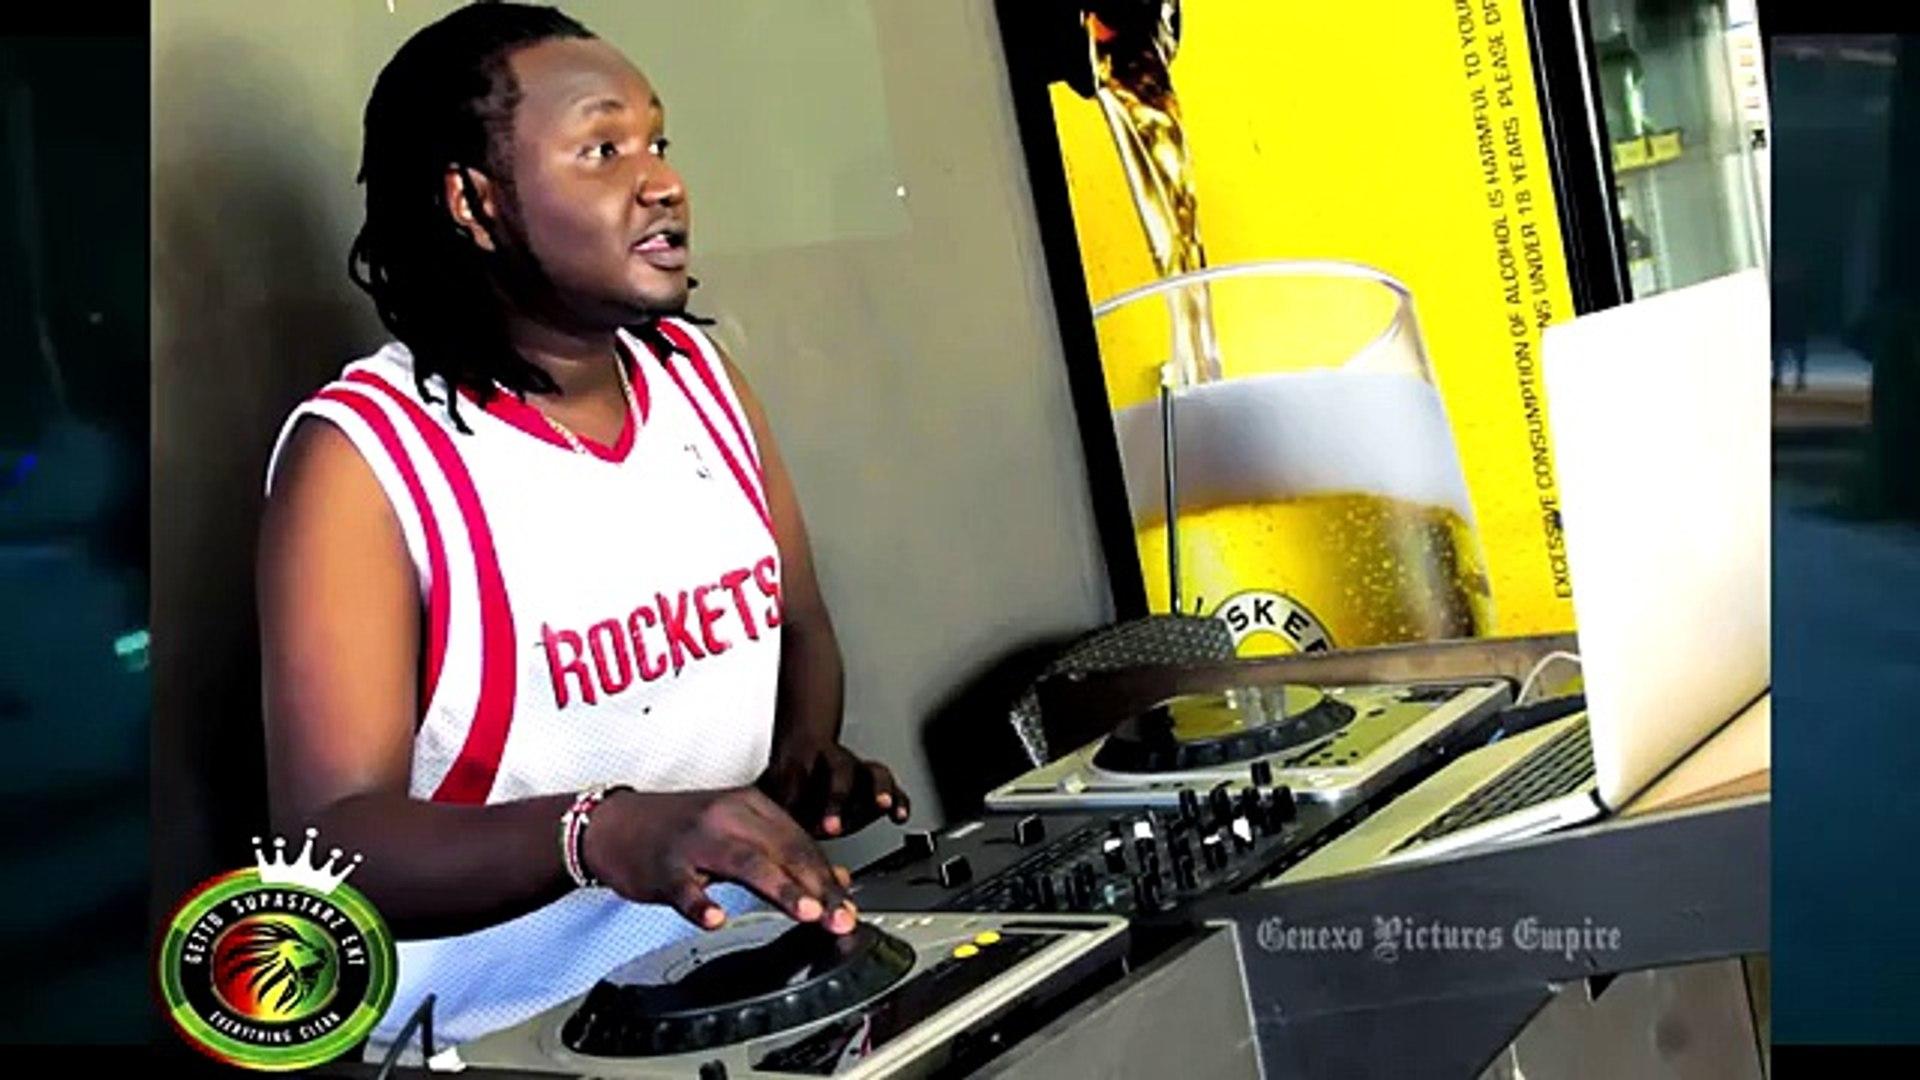 DJ BUNDUKI  -New Hip Hop Rap Music Mix 2017 Rap Hip Hop Mix 2017 Intro (RH EXCLUSIVE)